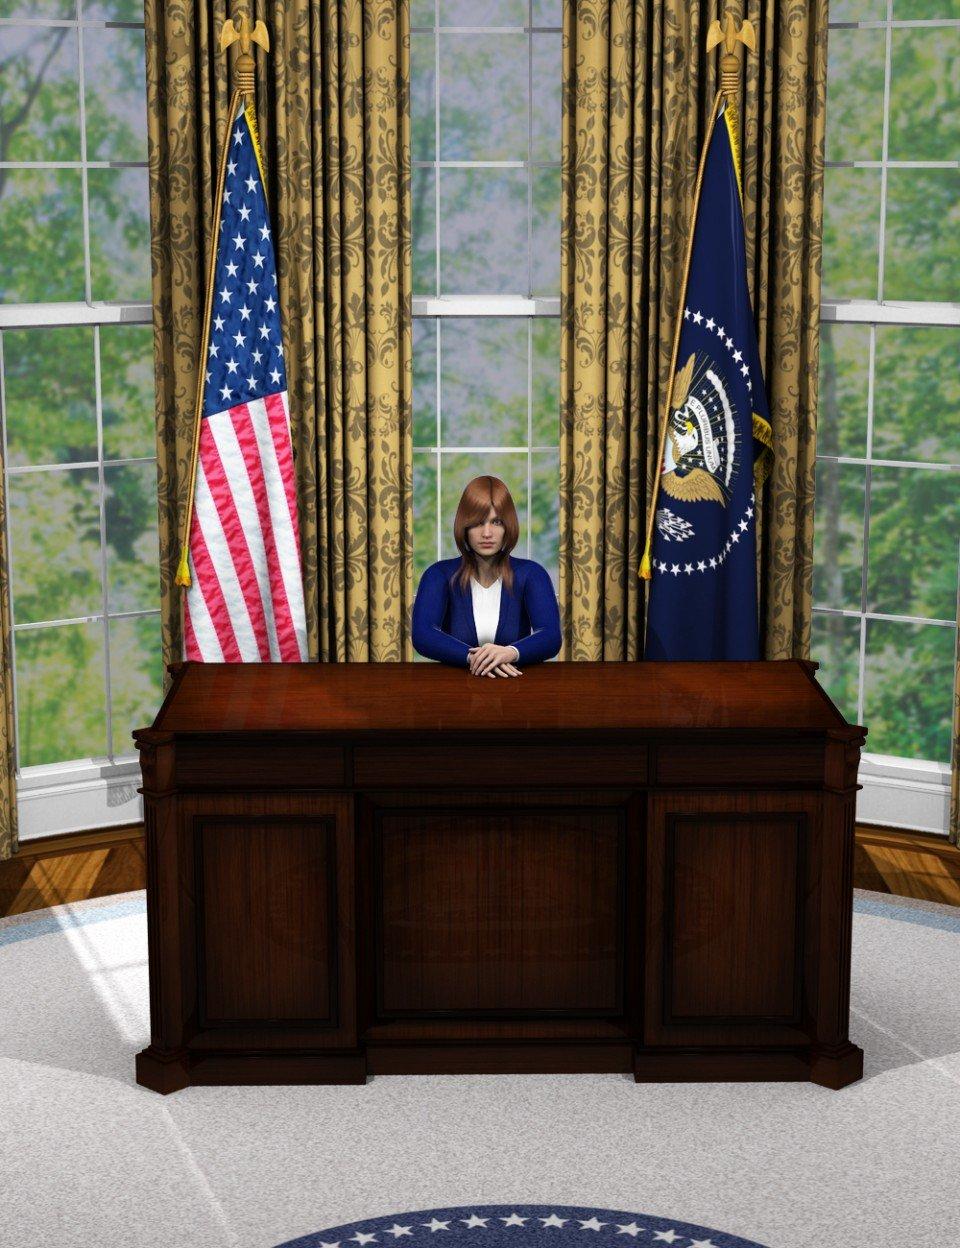 Oval Office_DAZ3D下载站